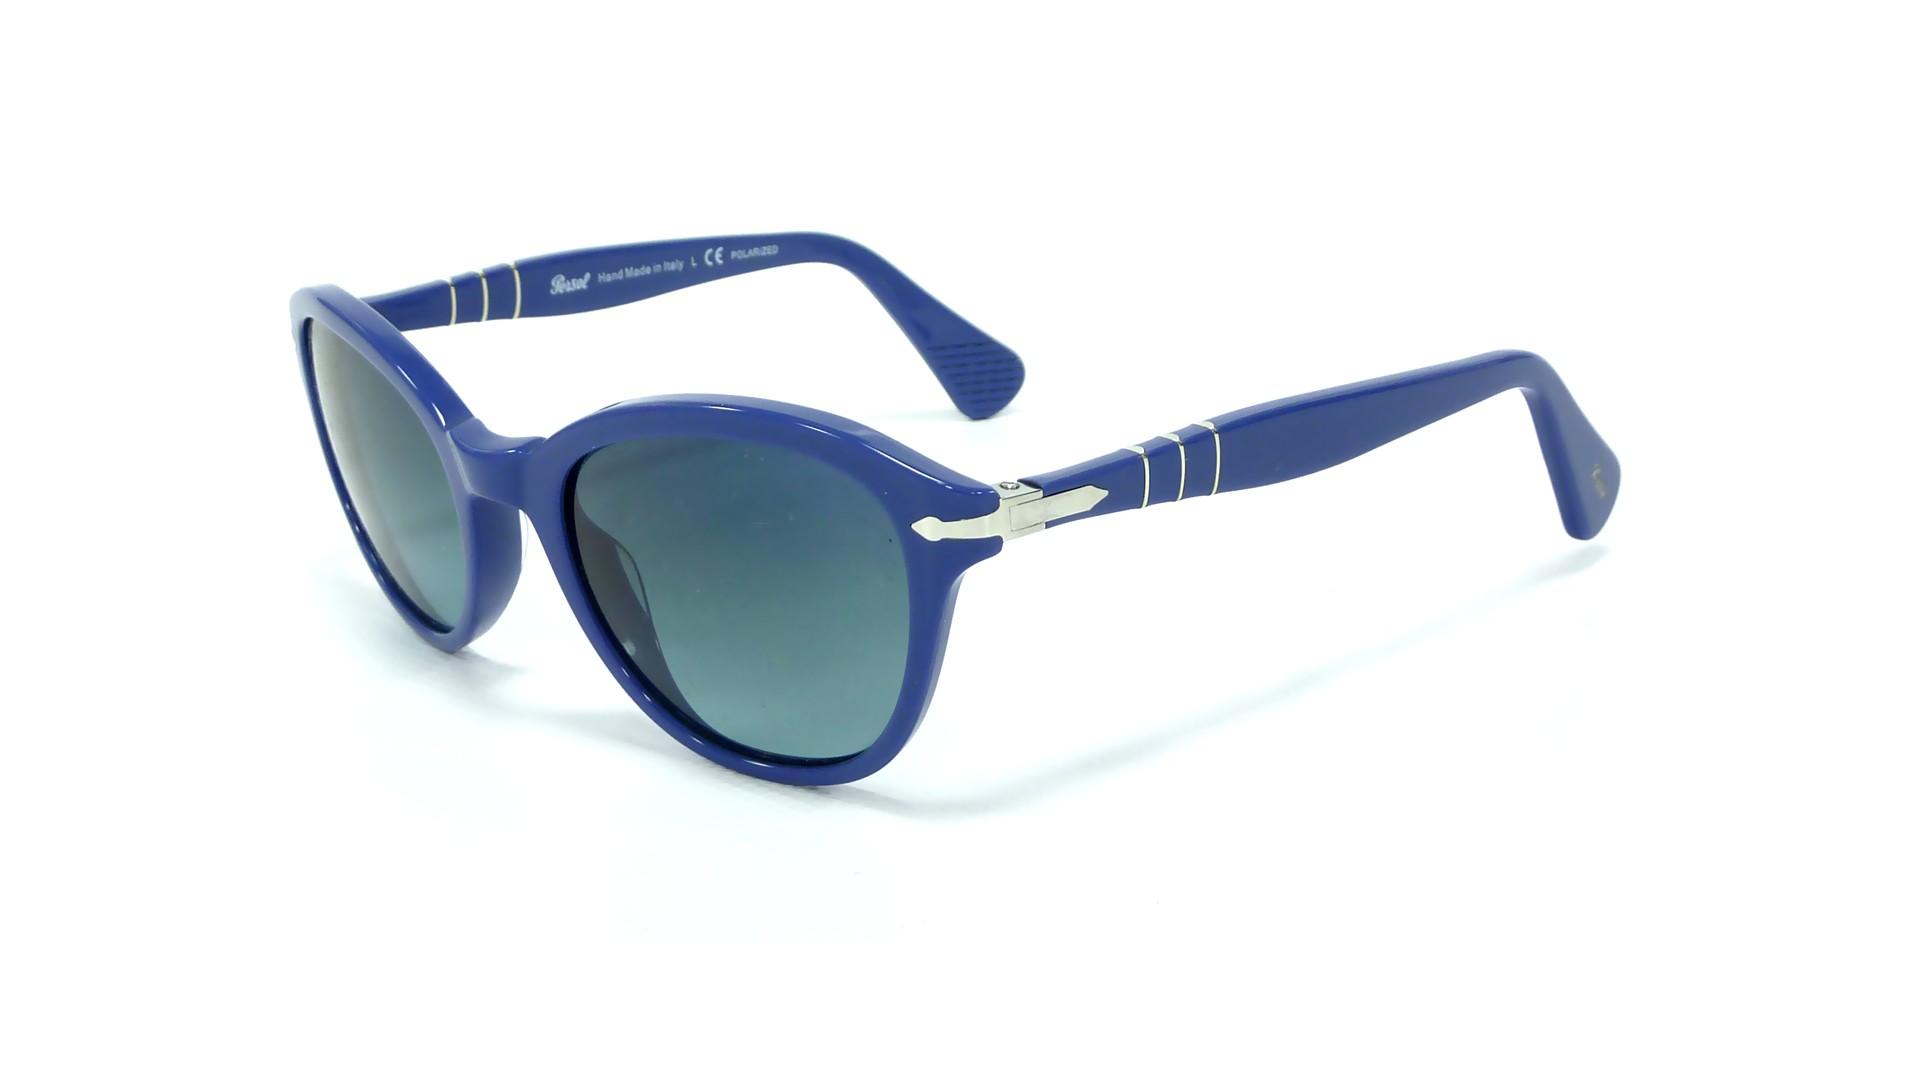 Persol Photochromic Polarized Sunglasses   www.tapdance.org